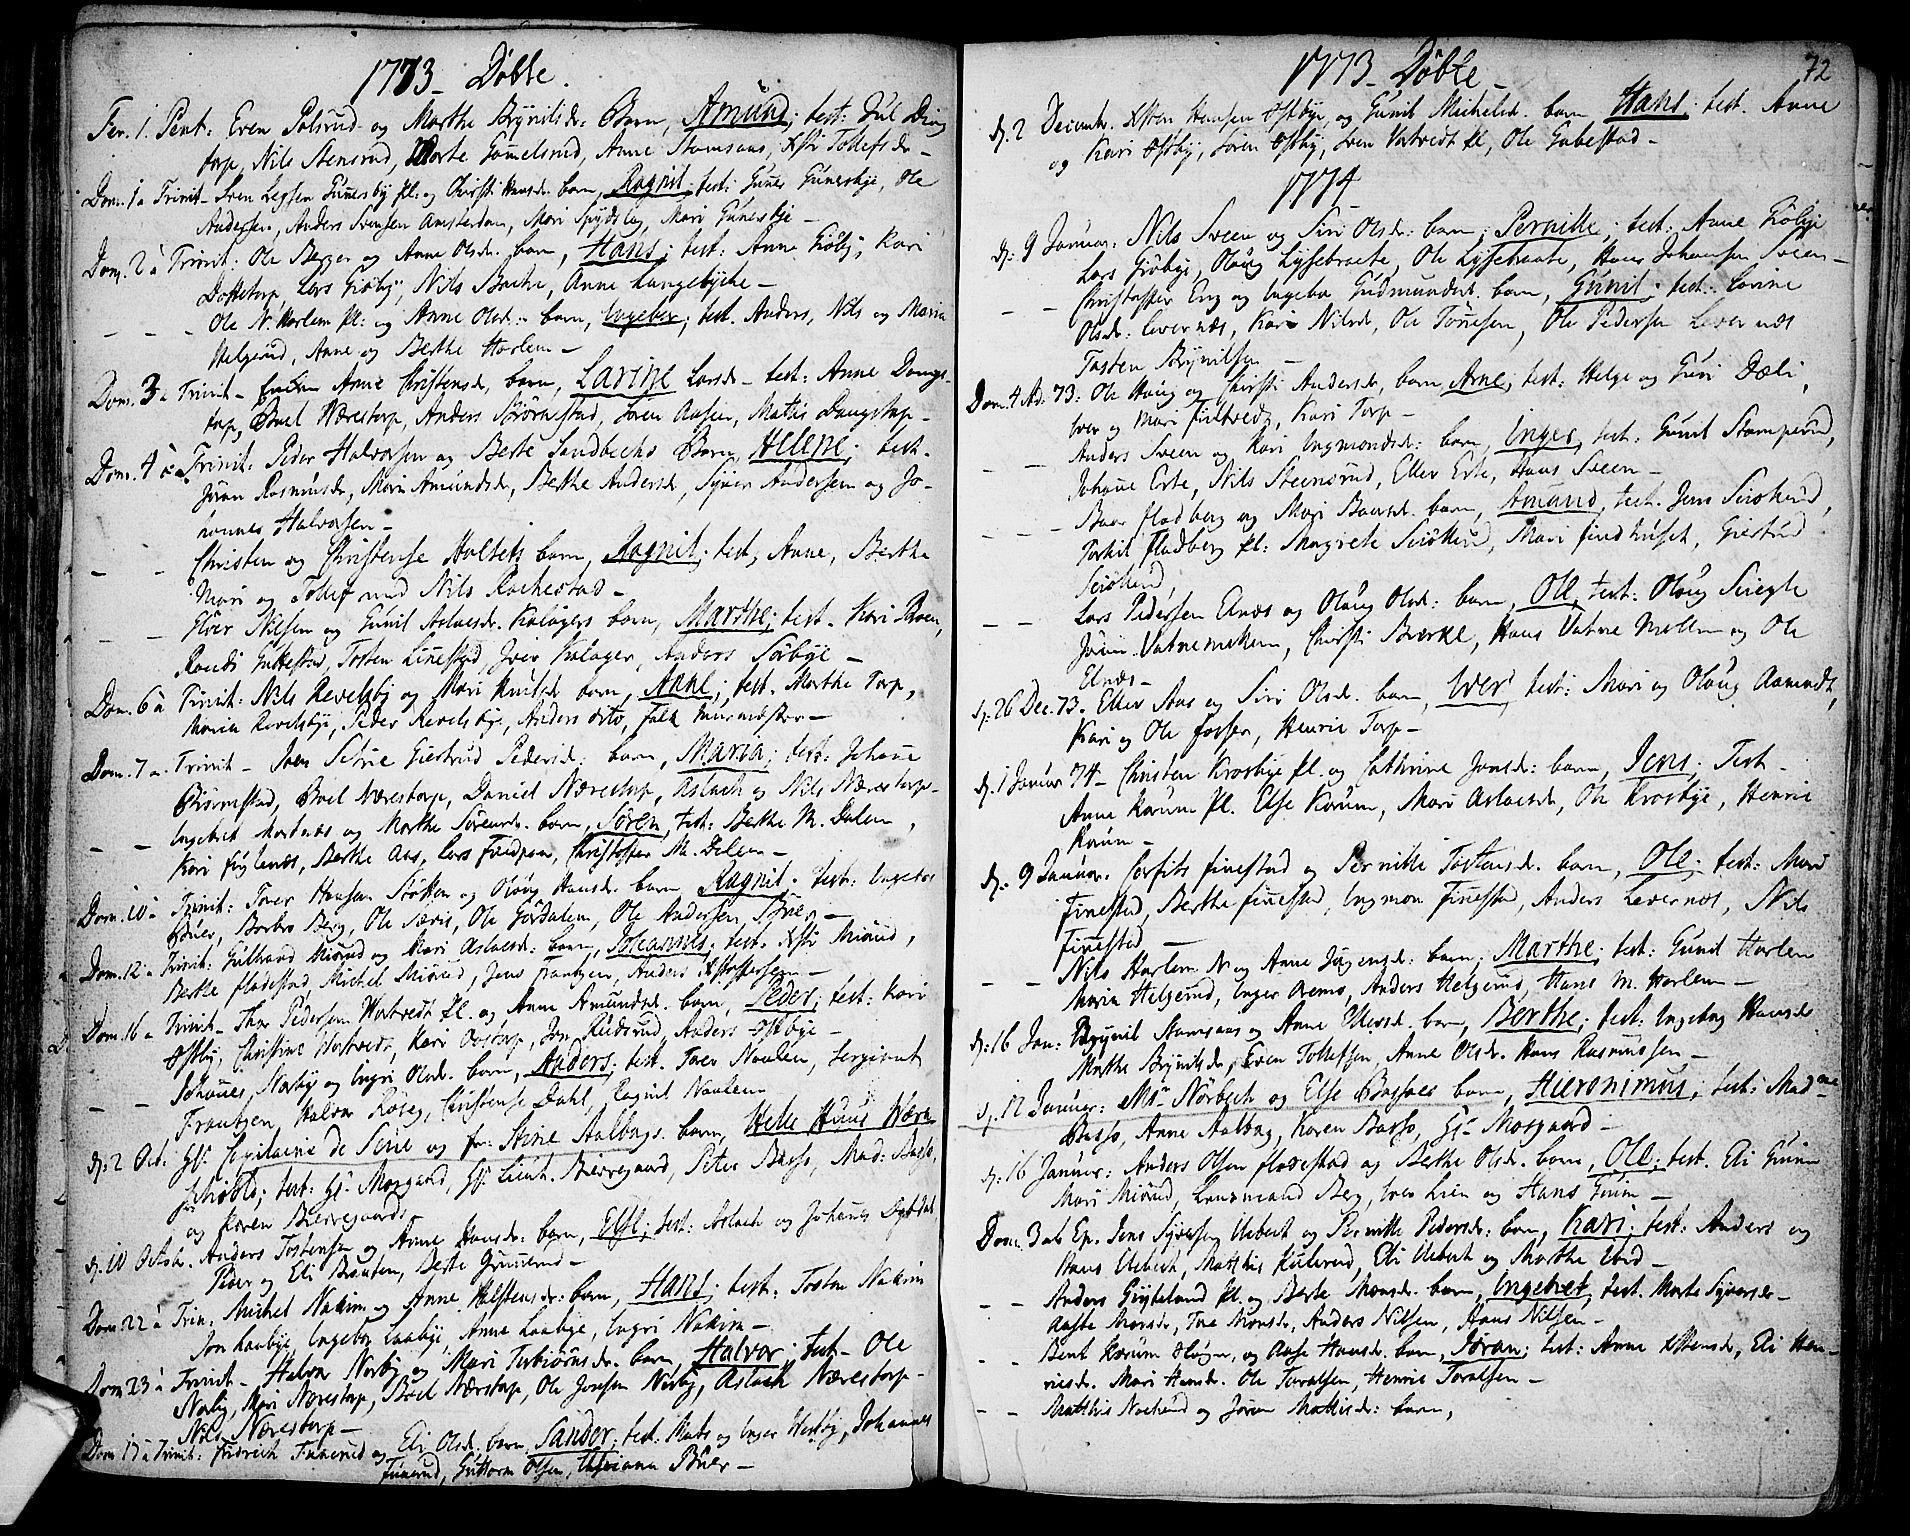 SAO, Rakkestad prestekontor Kirkebøker, F/Fa/L0003: Ministerialbok nr. I 3, 1752-1777, s. 72